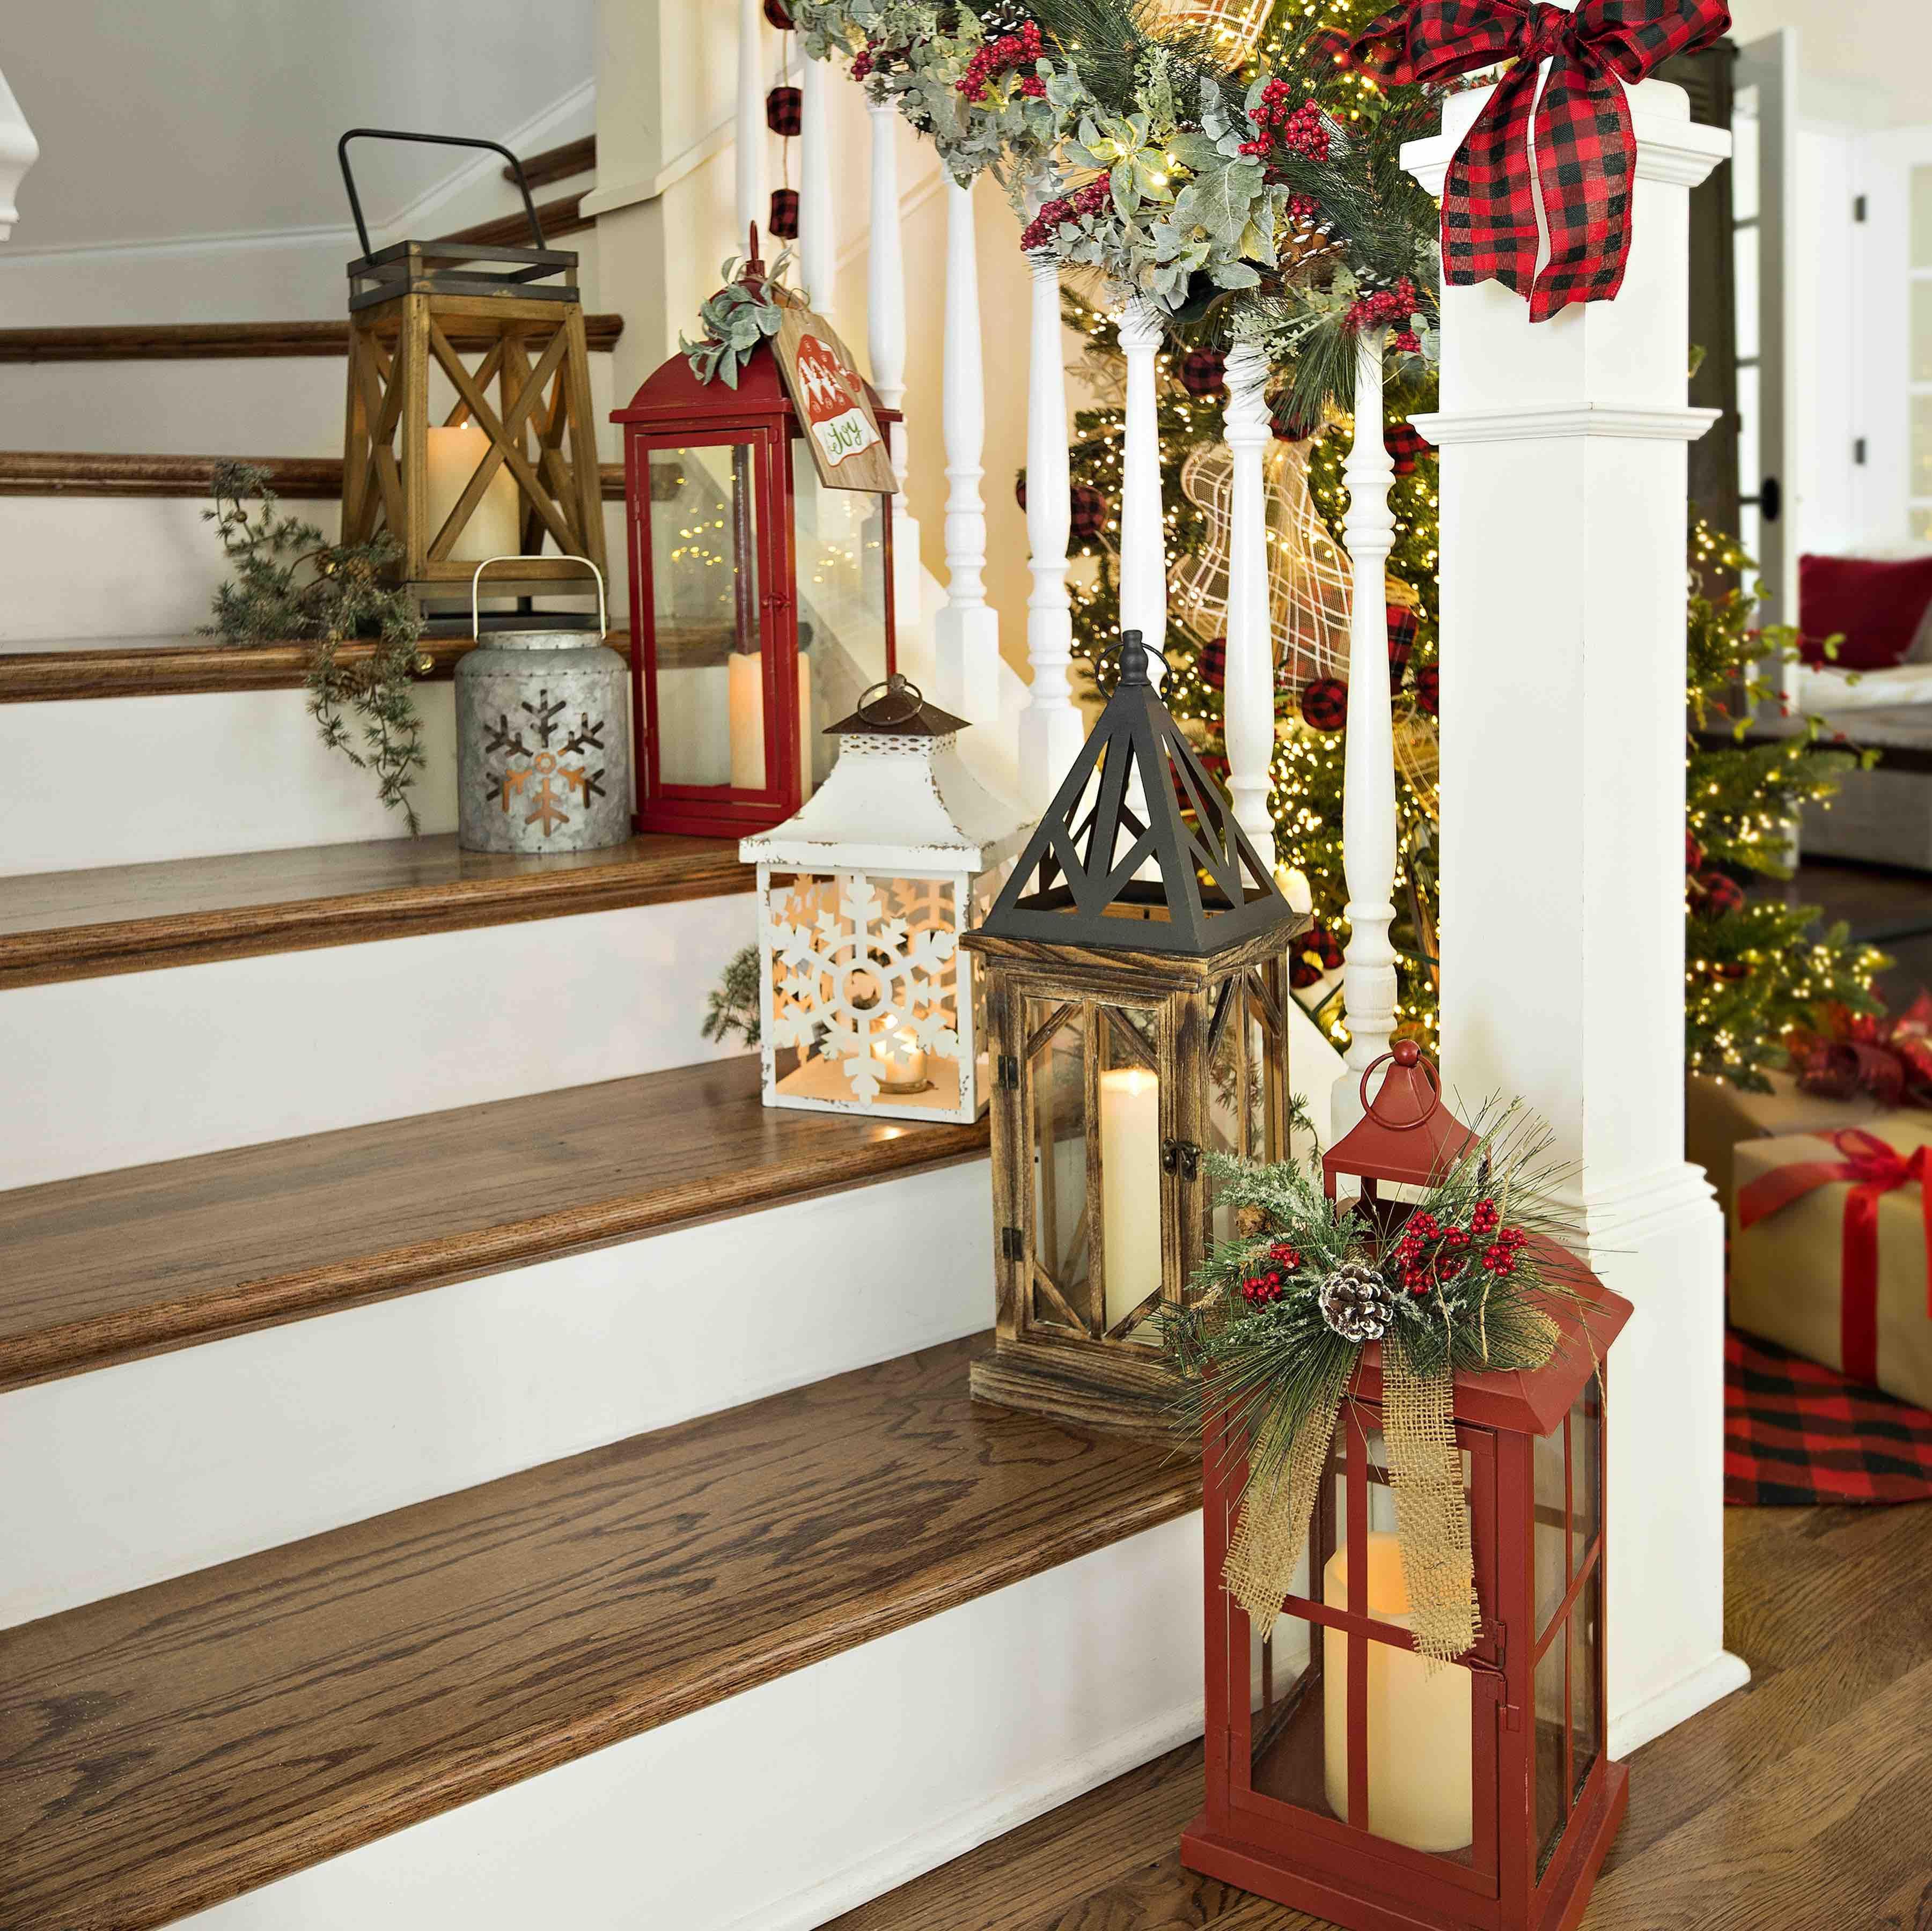 Lanterns Are A Holiday Decor Staple Christmas Entryway